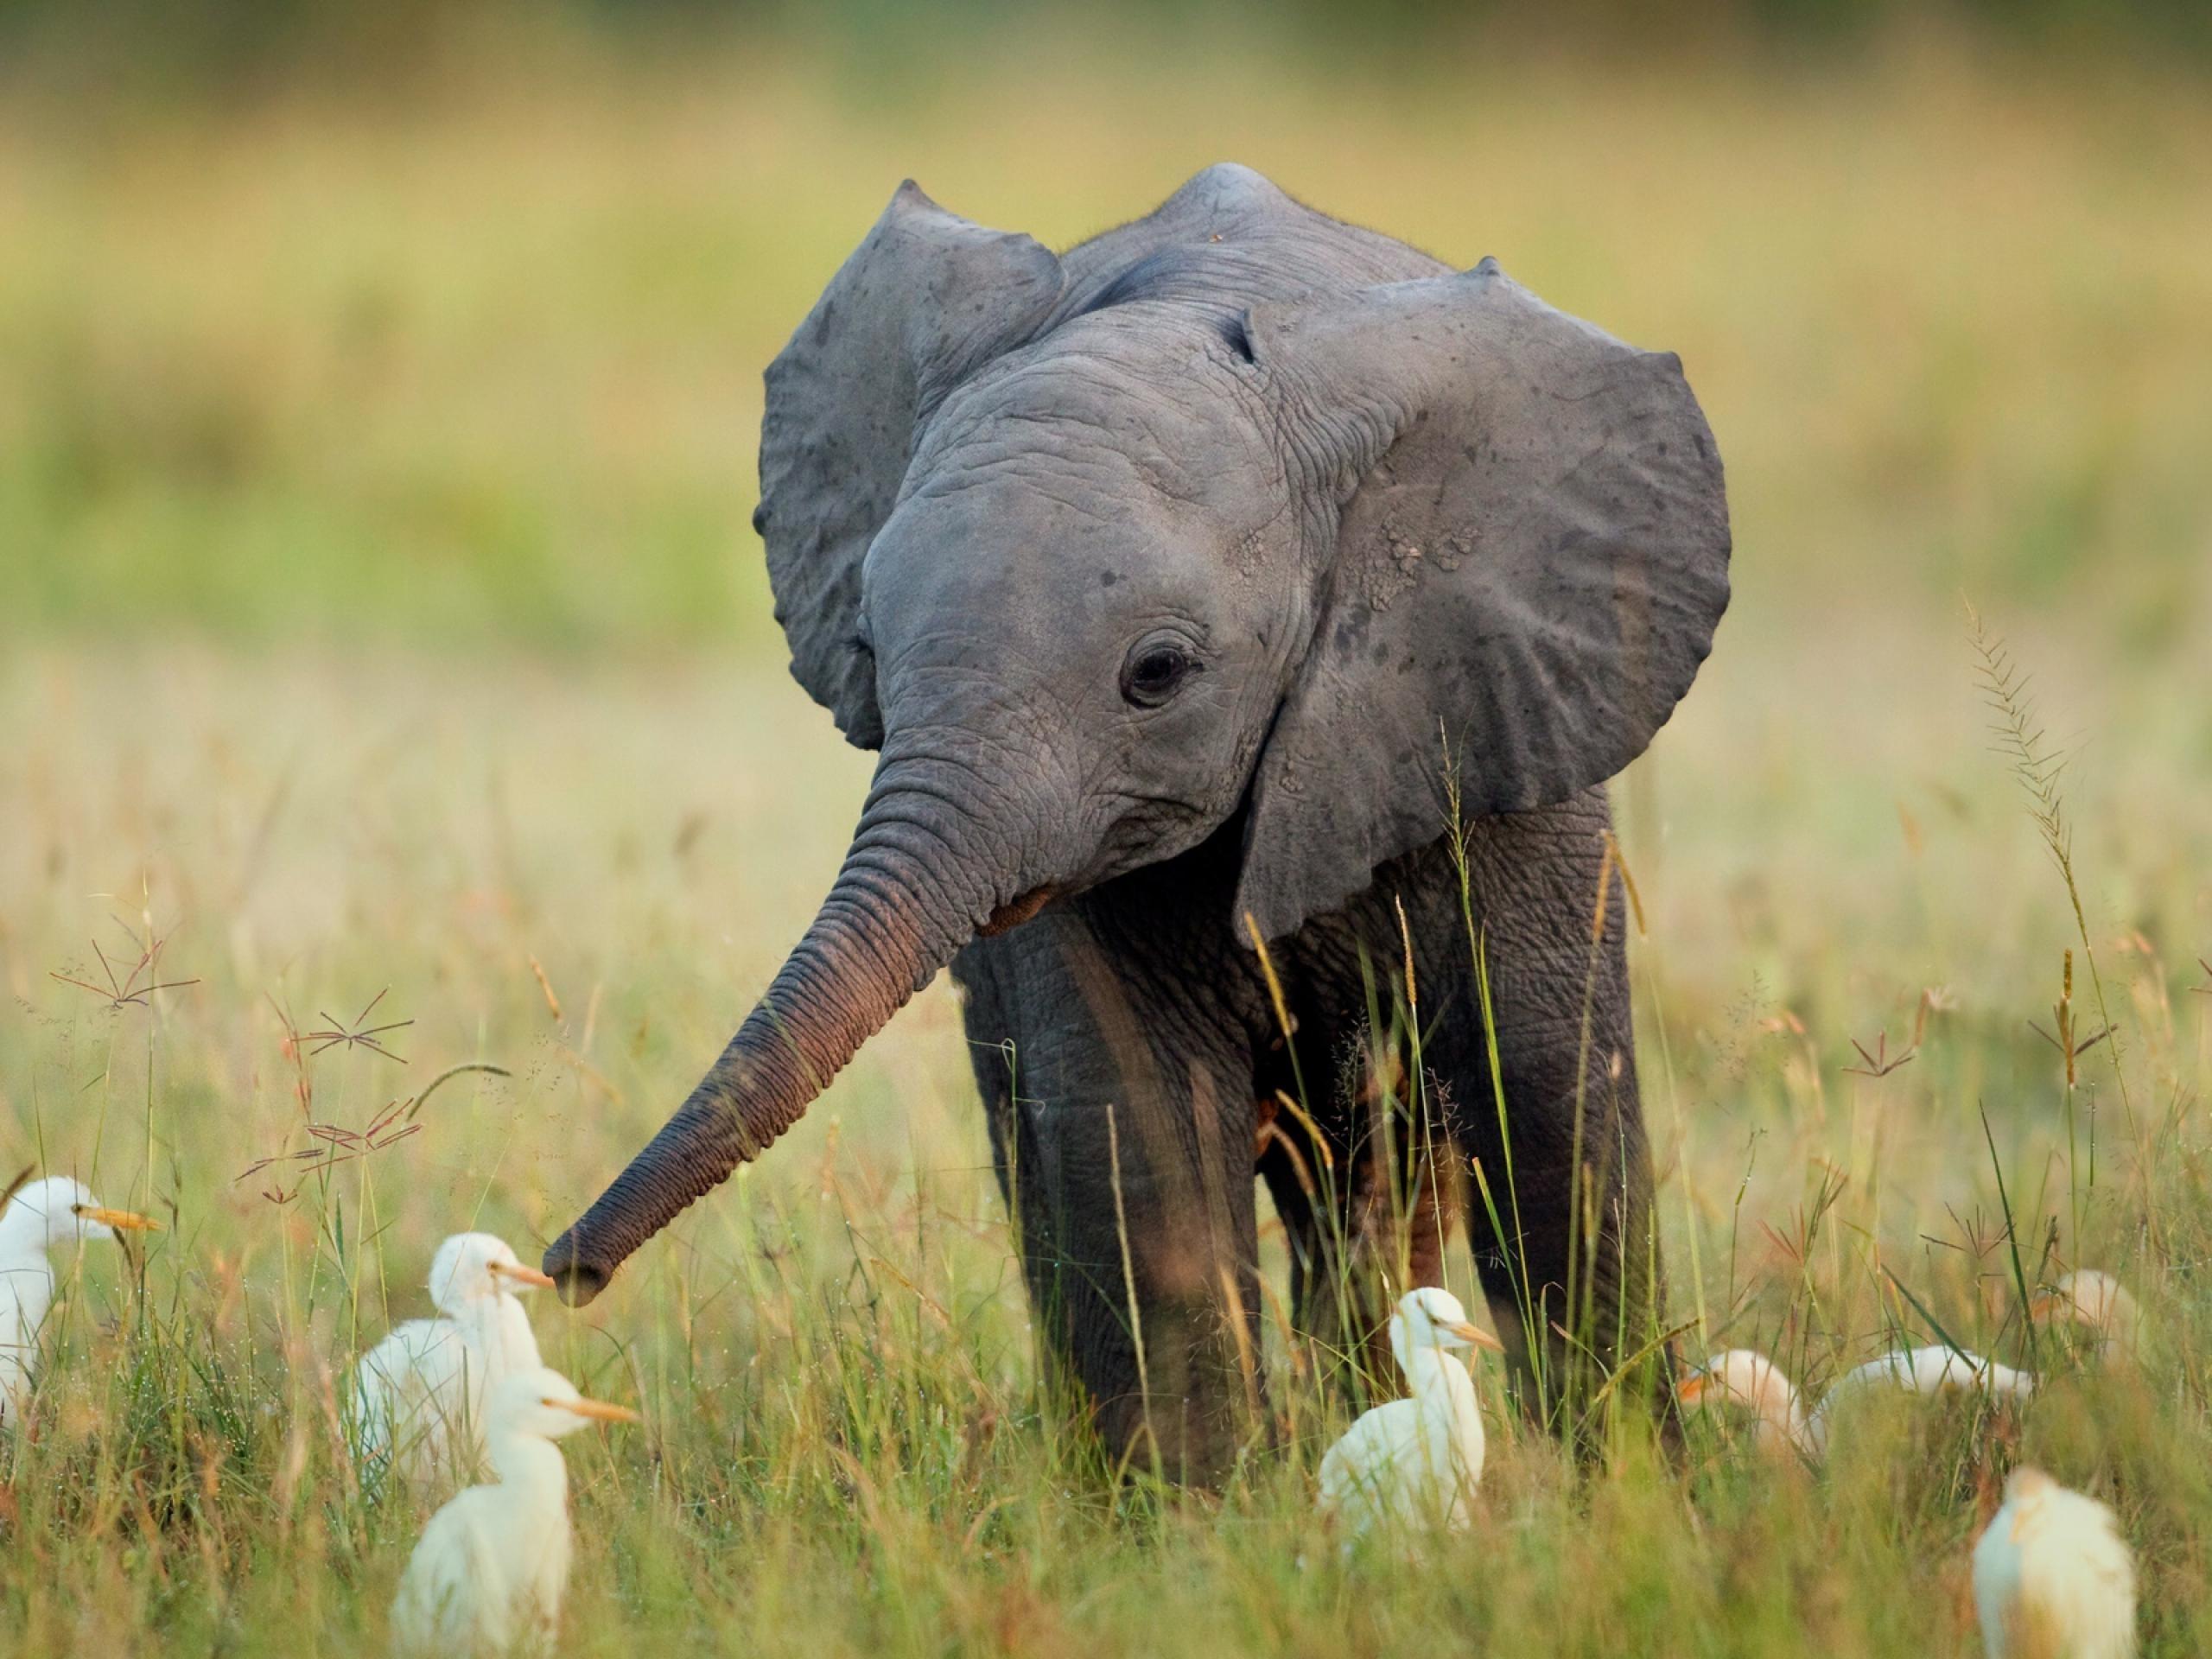 baby elephant & egrets | animals | know your meme